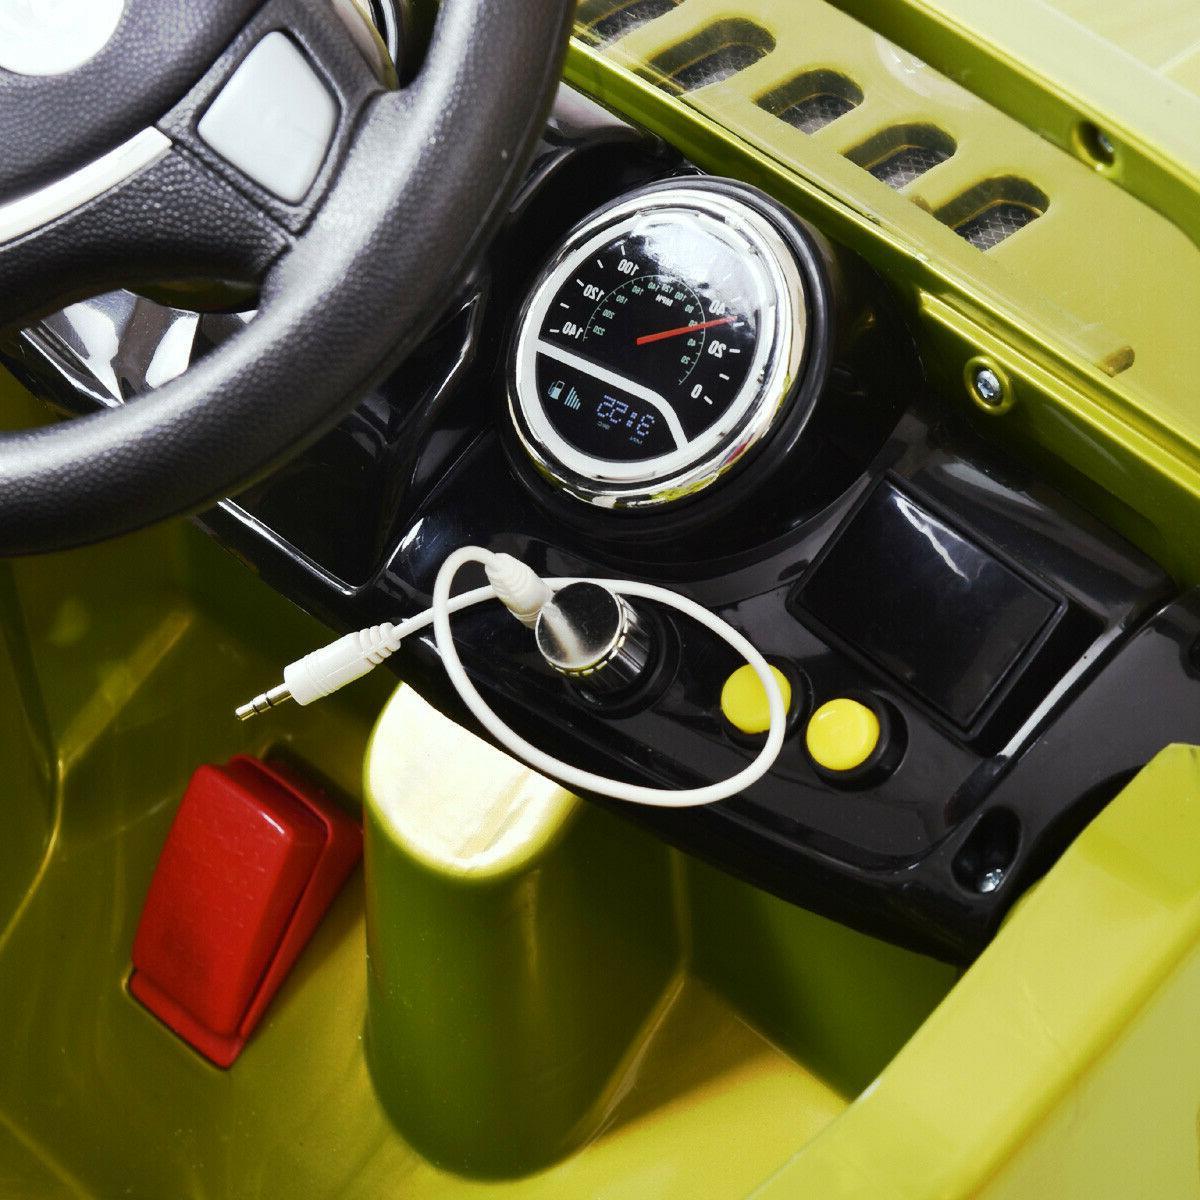 12V RC Power Wheels Truck Kids W/